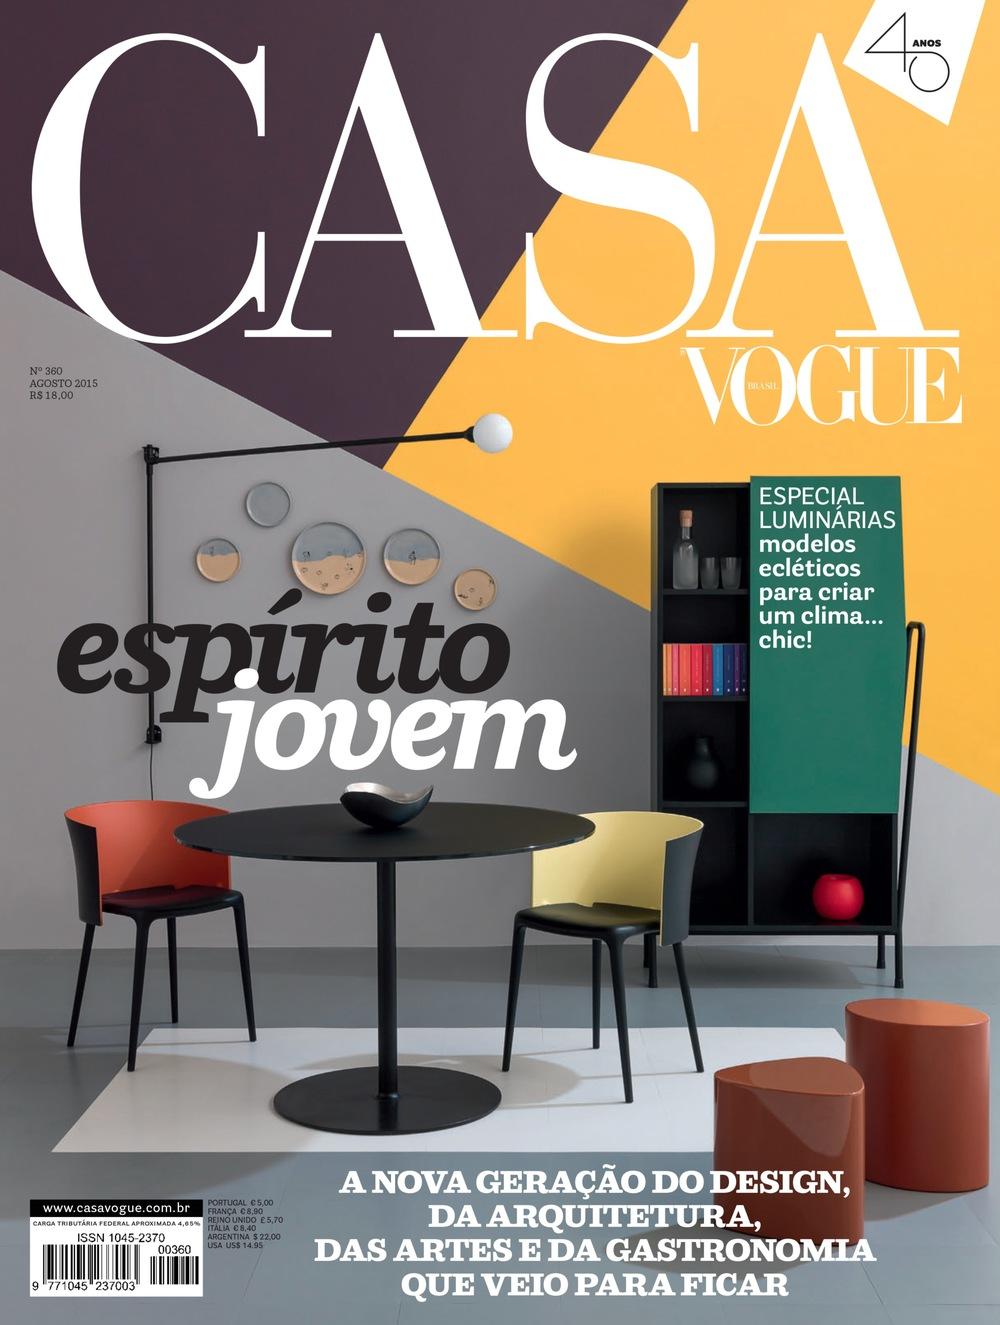 Casa Vogue Brasil_August 2015_1 Hotel South Beach crop.jpg